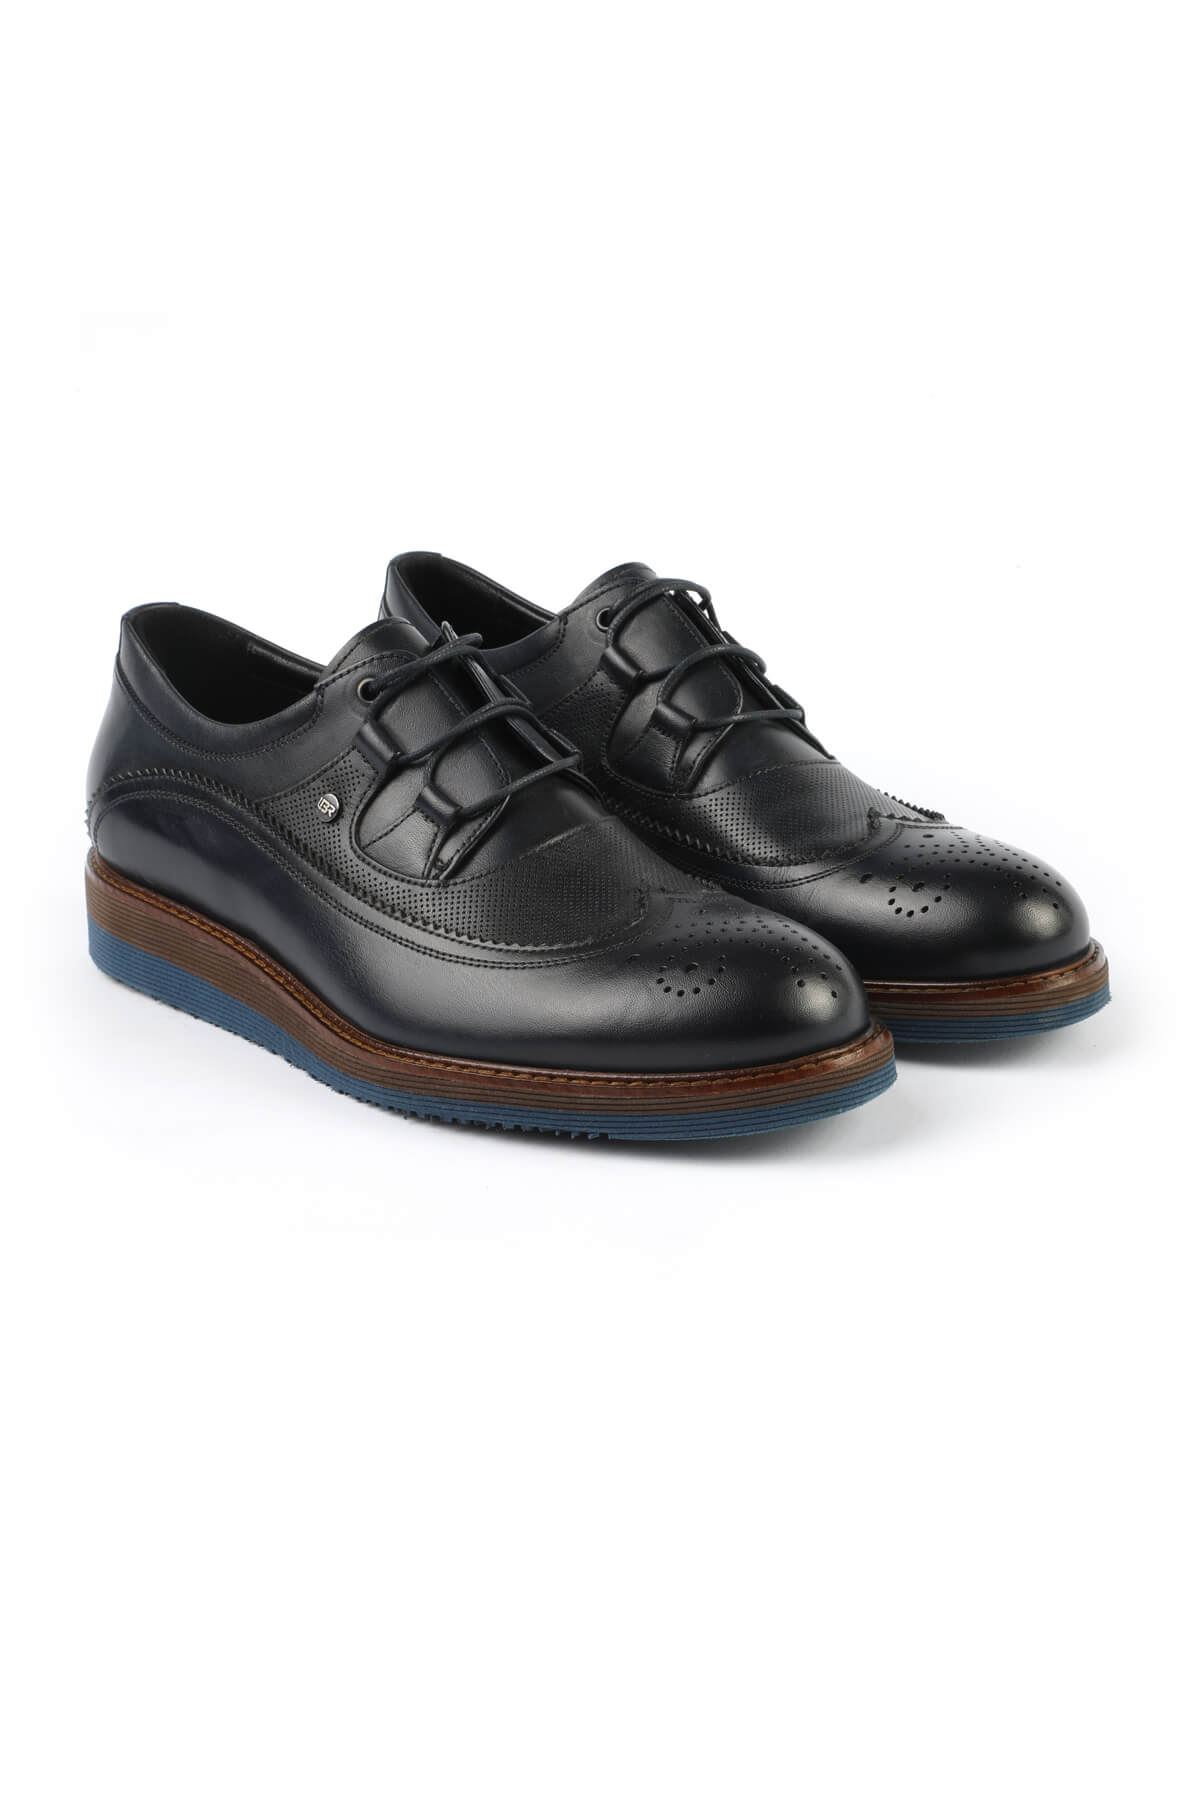 Libero 2902 Navy Blue Oxford Shoes